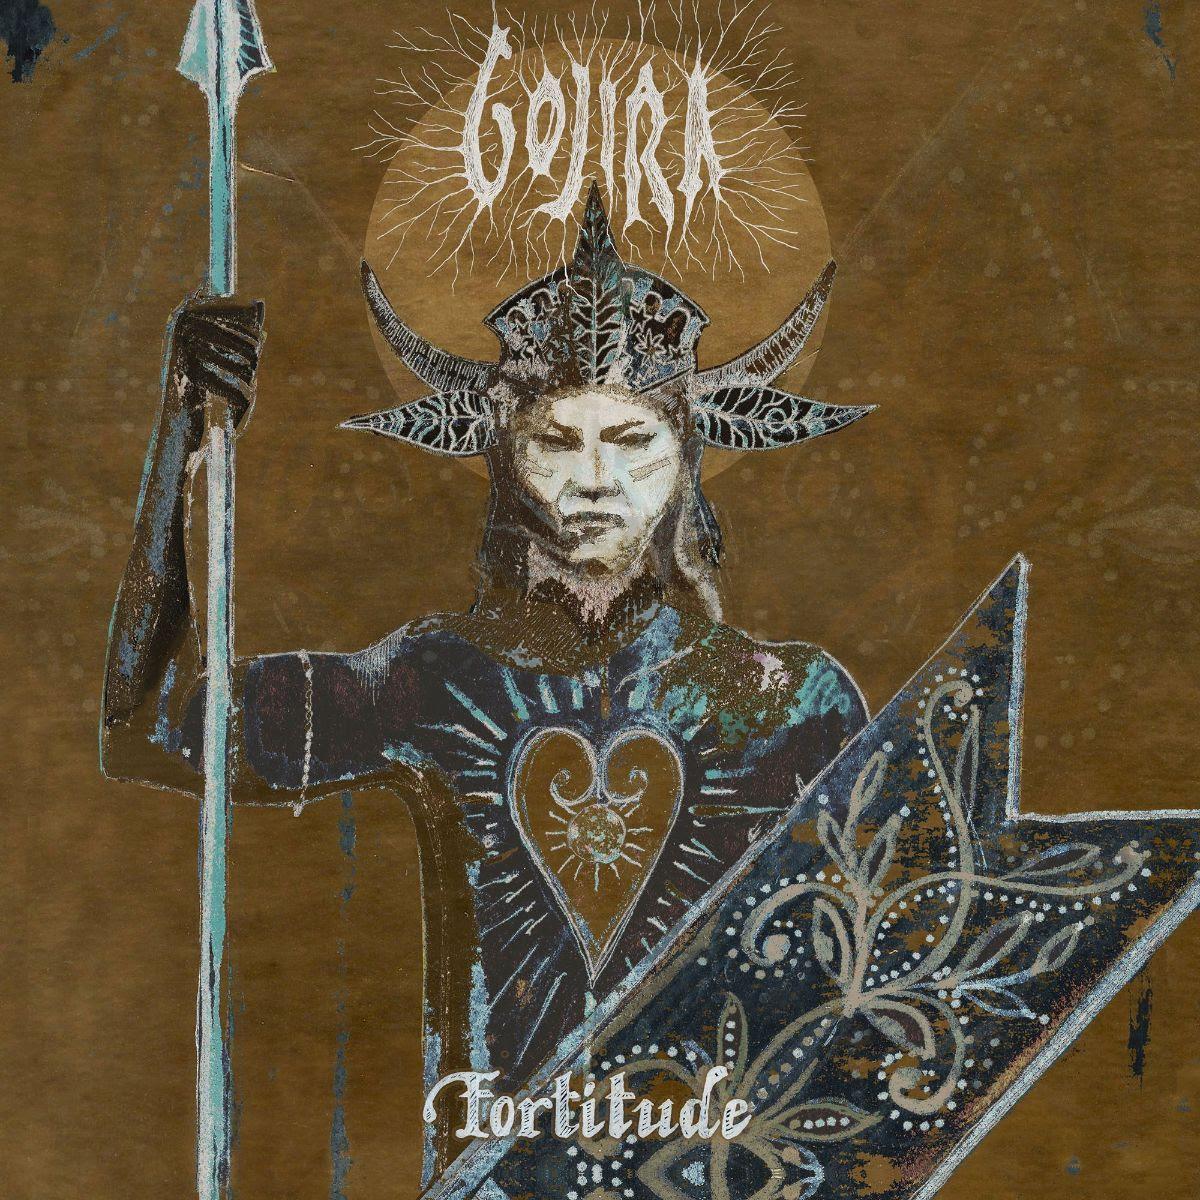 Gojira publica hoy su nuevo disco «Fortitude»